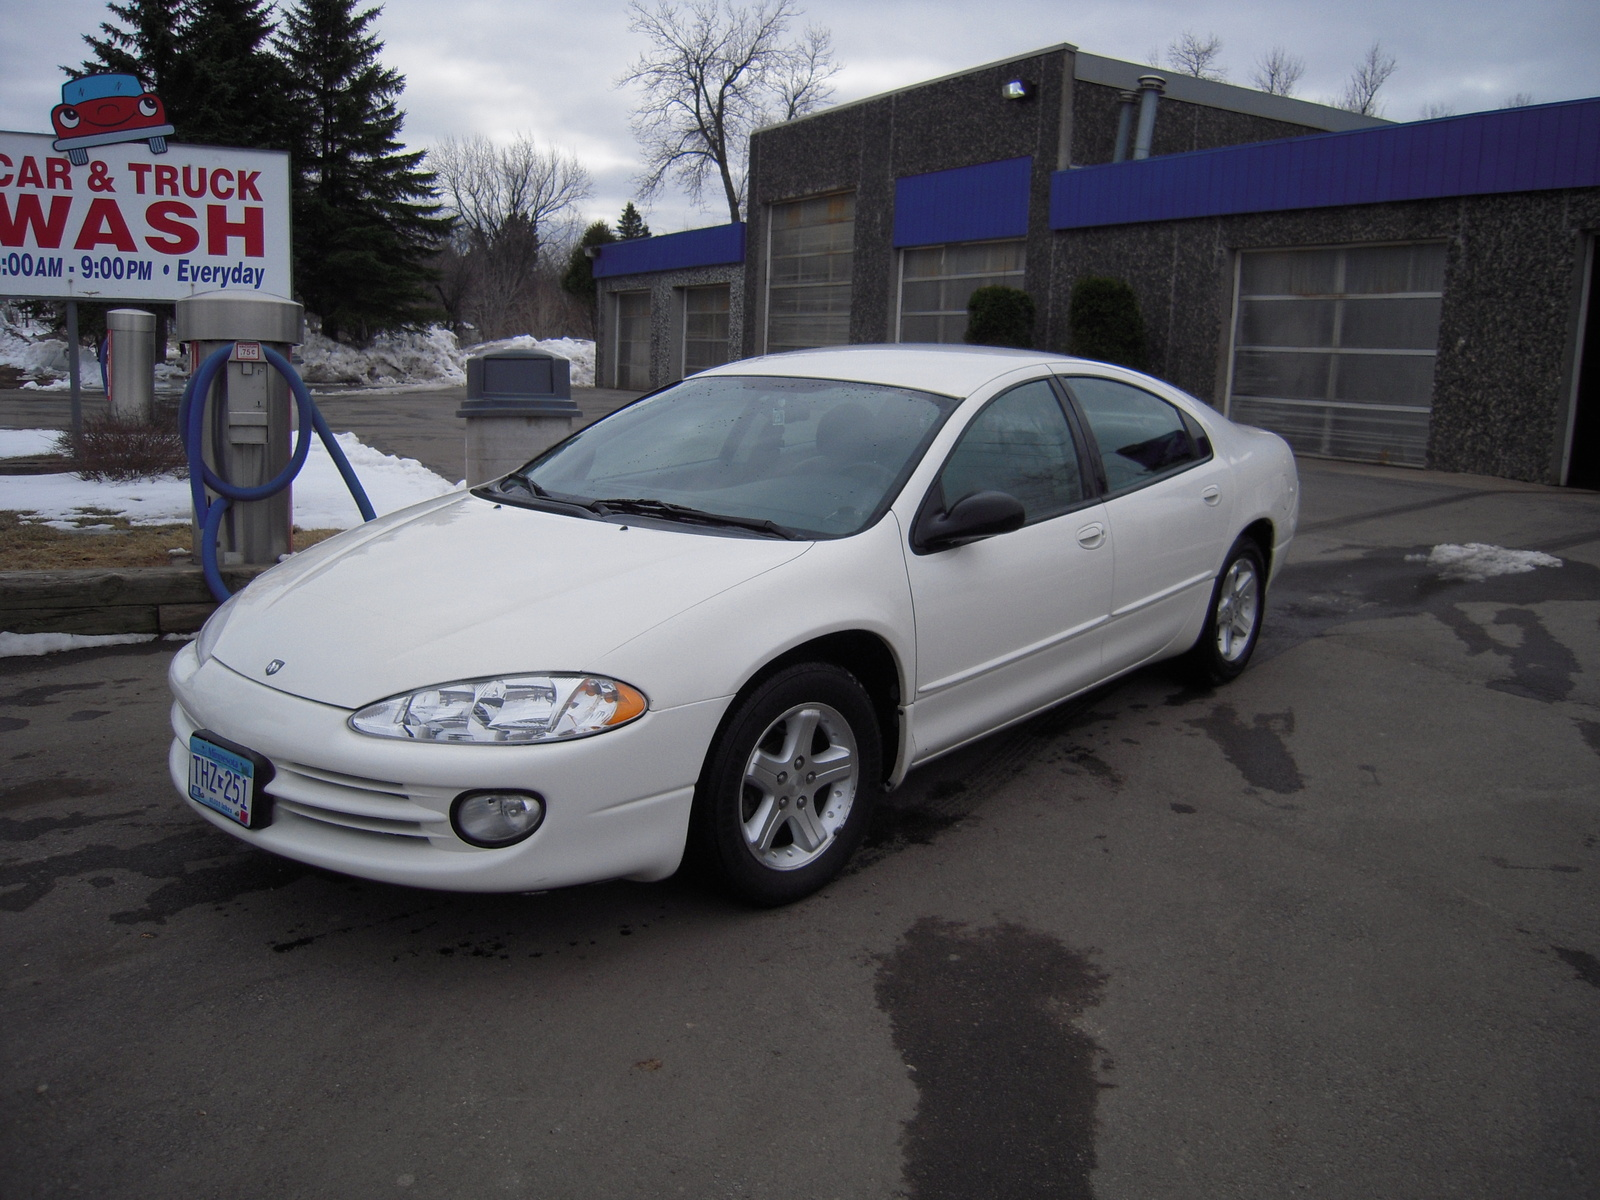 2004 Dodge Intrepid 19 Dodge